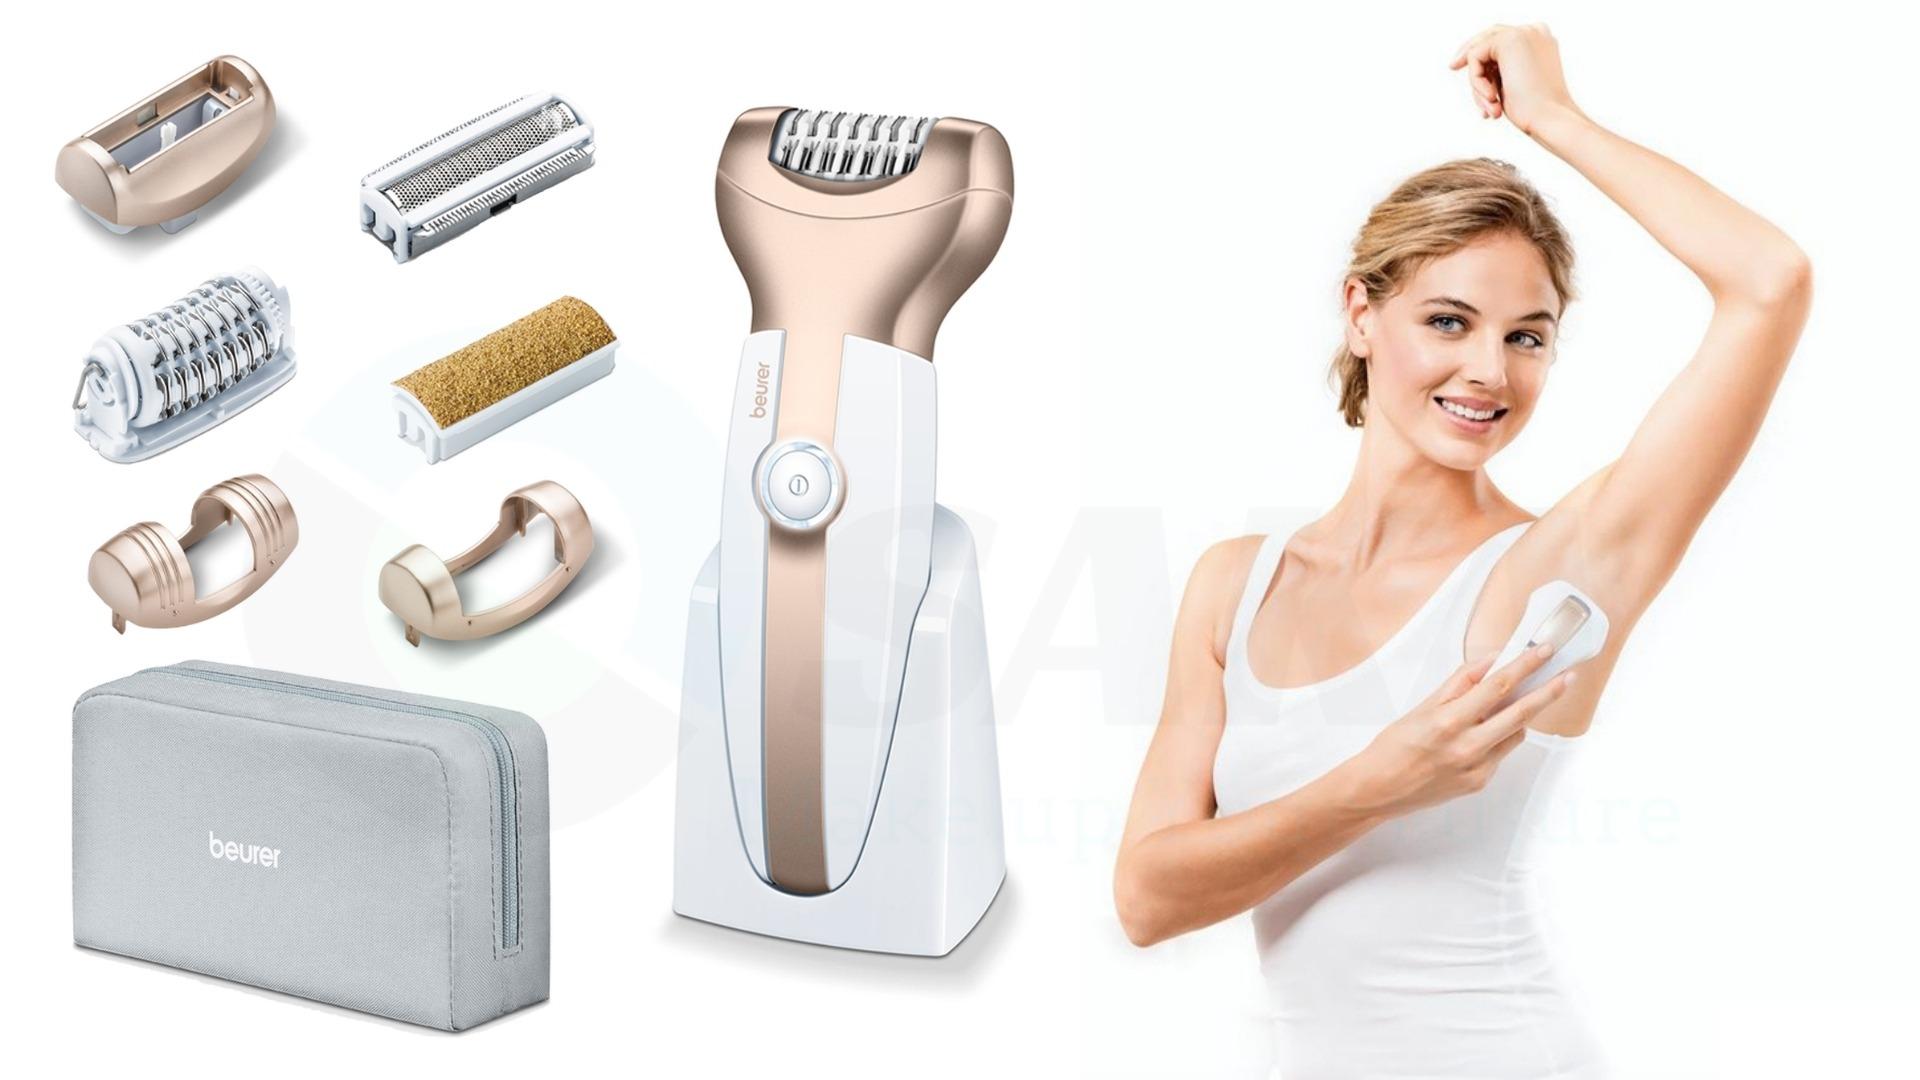 Máy triệt lông Beurer Pure Skin Pro IPL 8500